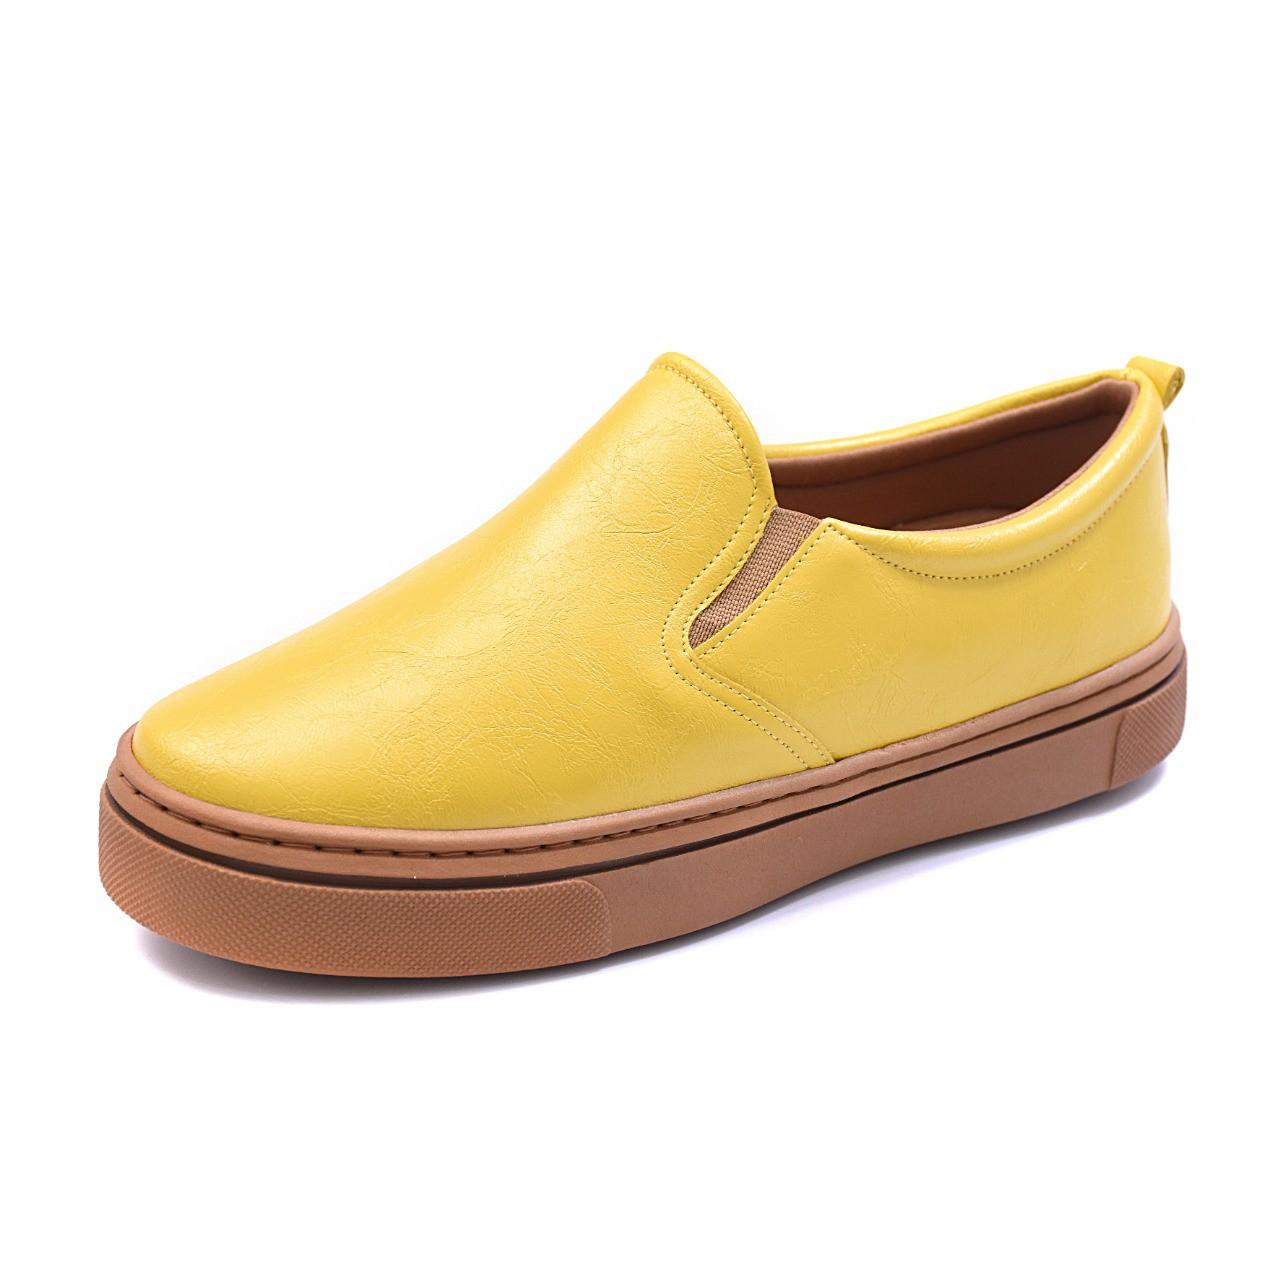 Slip on Feminino Gommix Shoes 067 Verniz